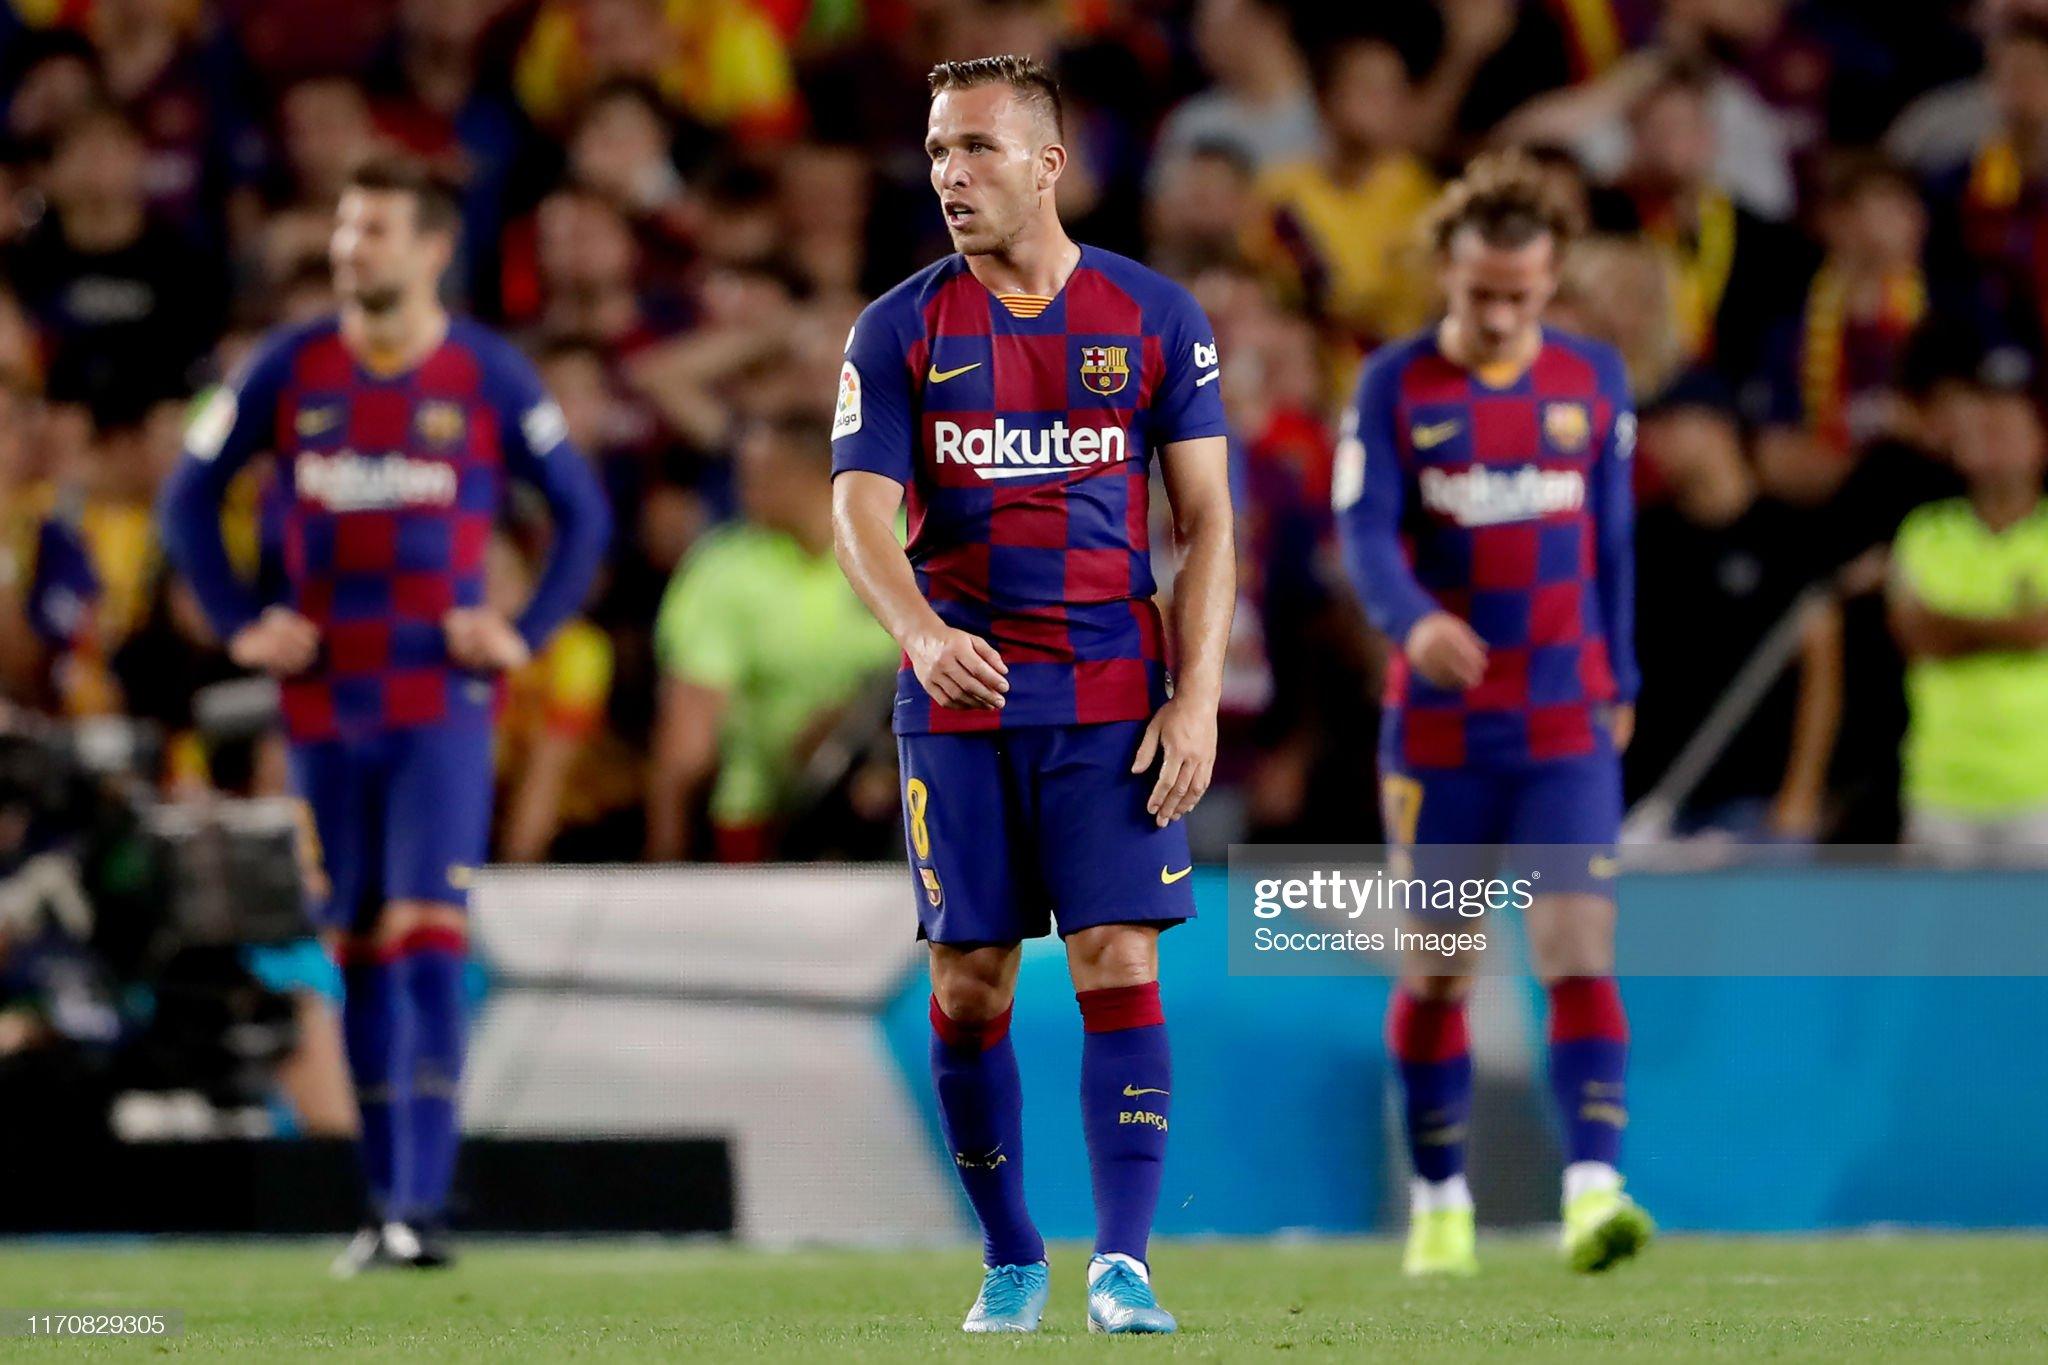 صور مباراة : برشلونة - فياريال 2-1 ( 24-09-2019 )  Arthur-of-fc-barcelona-during-the-la-liga-santander-match-between-fc-picture-id1170829305?s=2048x2048